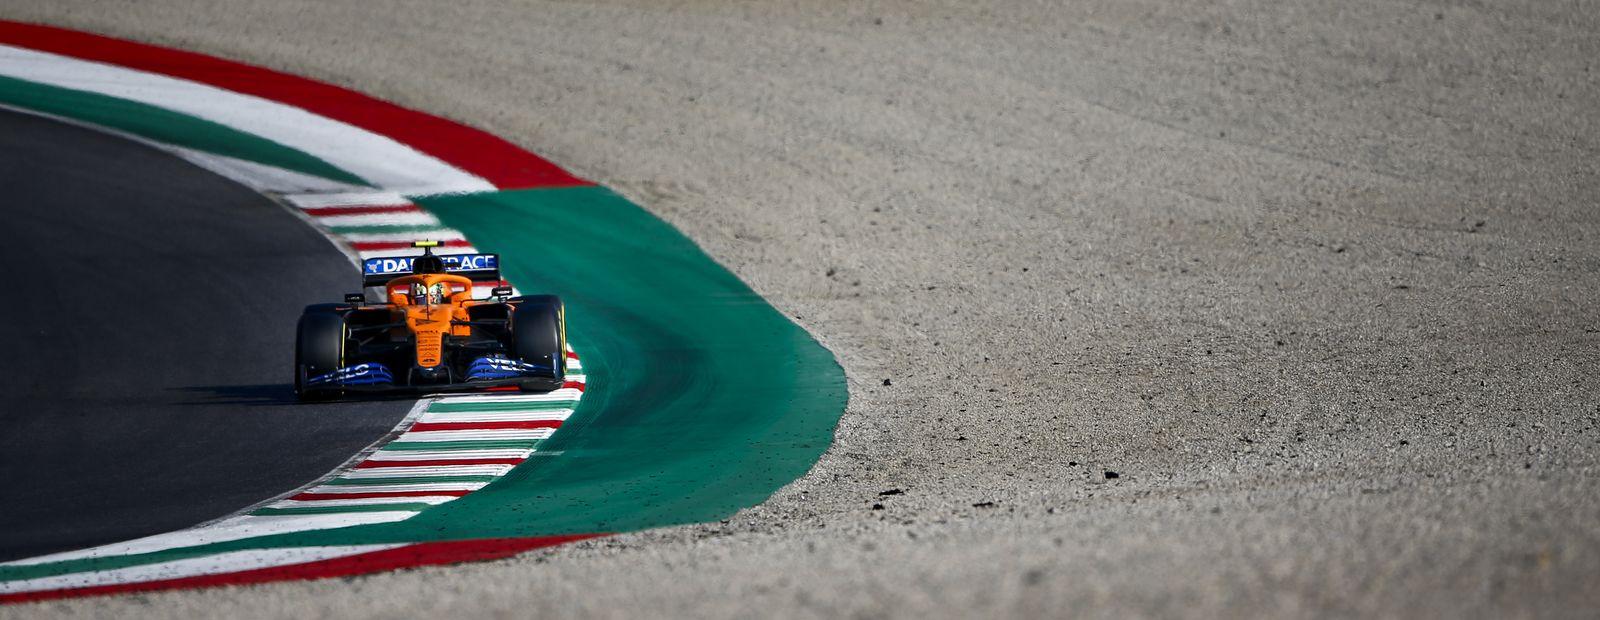 Gran Premio de la Toscana 2020